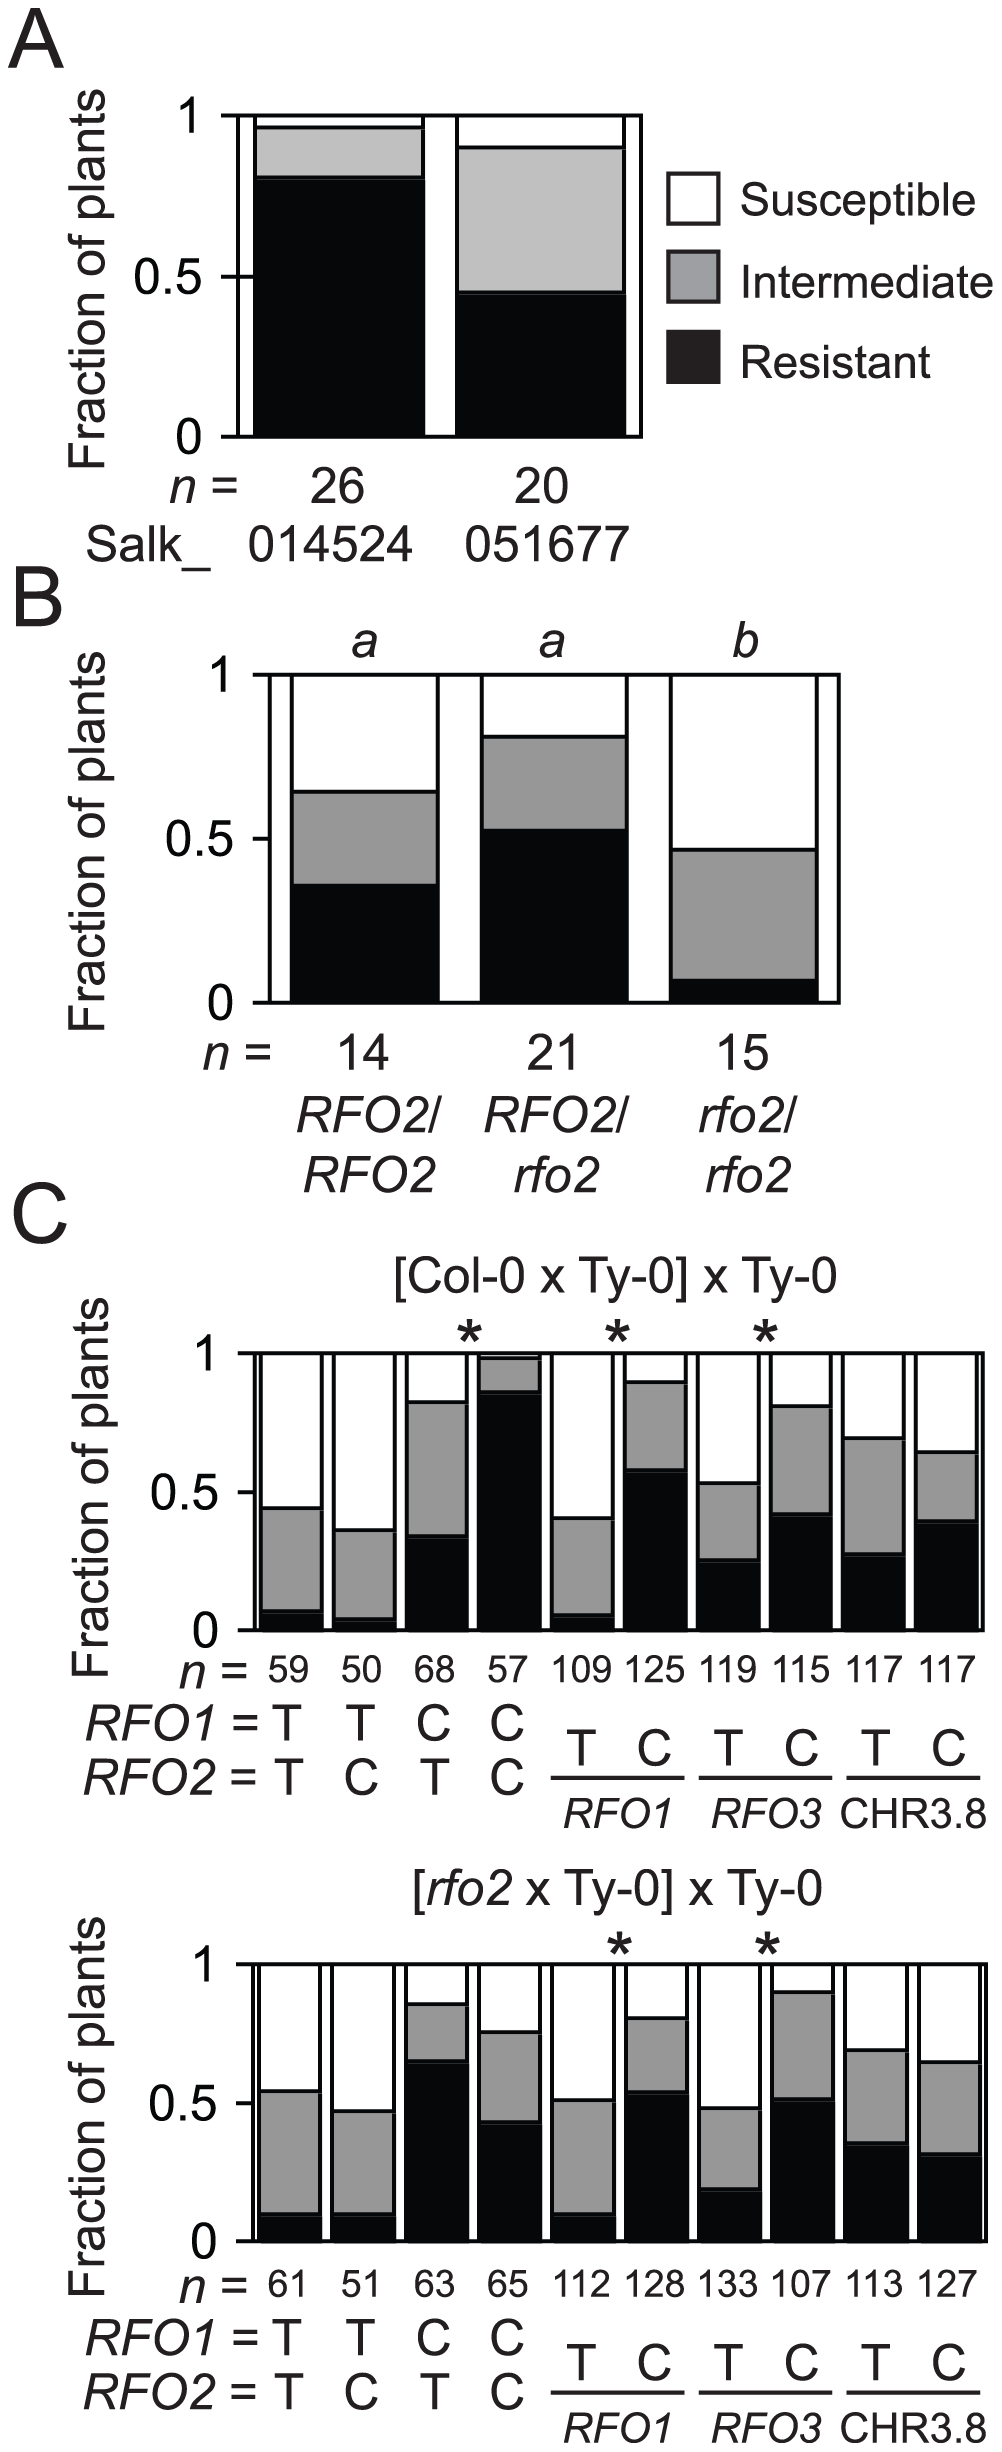 T-DNA insertion allele <i>rfo2</i> abolishes <i>RFO2</i> QTL.